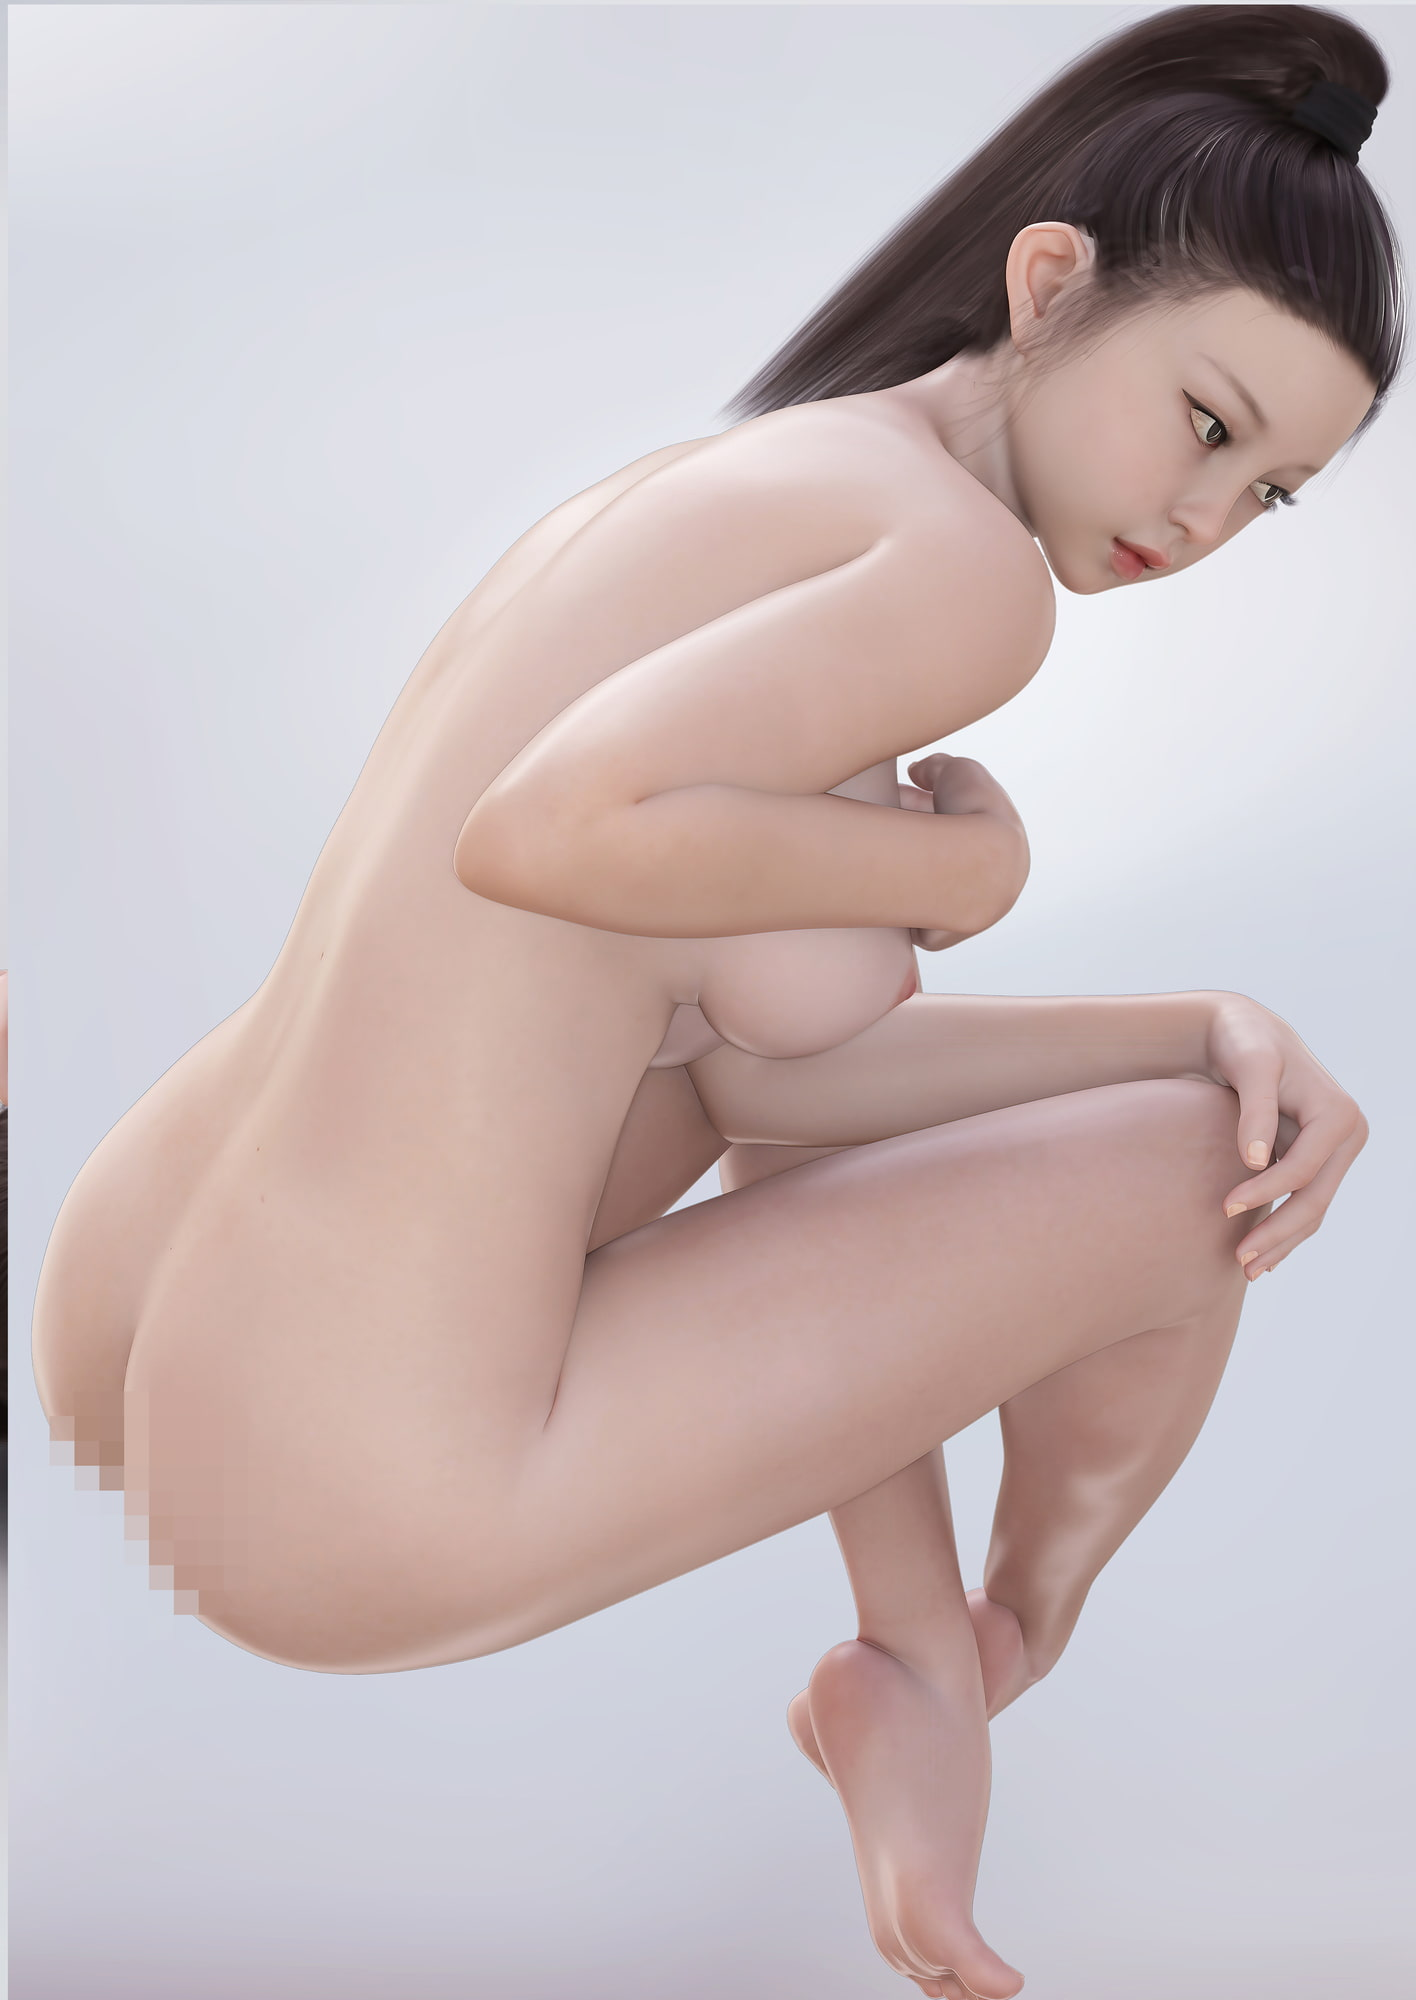 RJ314553 フィギュアスケート女子部彼女のグラビア写真集 [20210121]